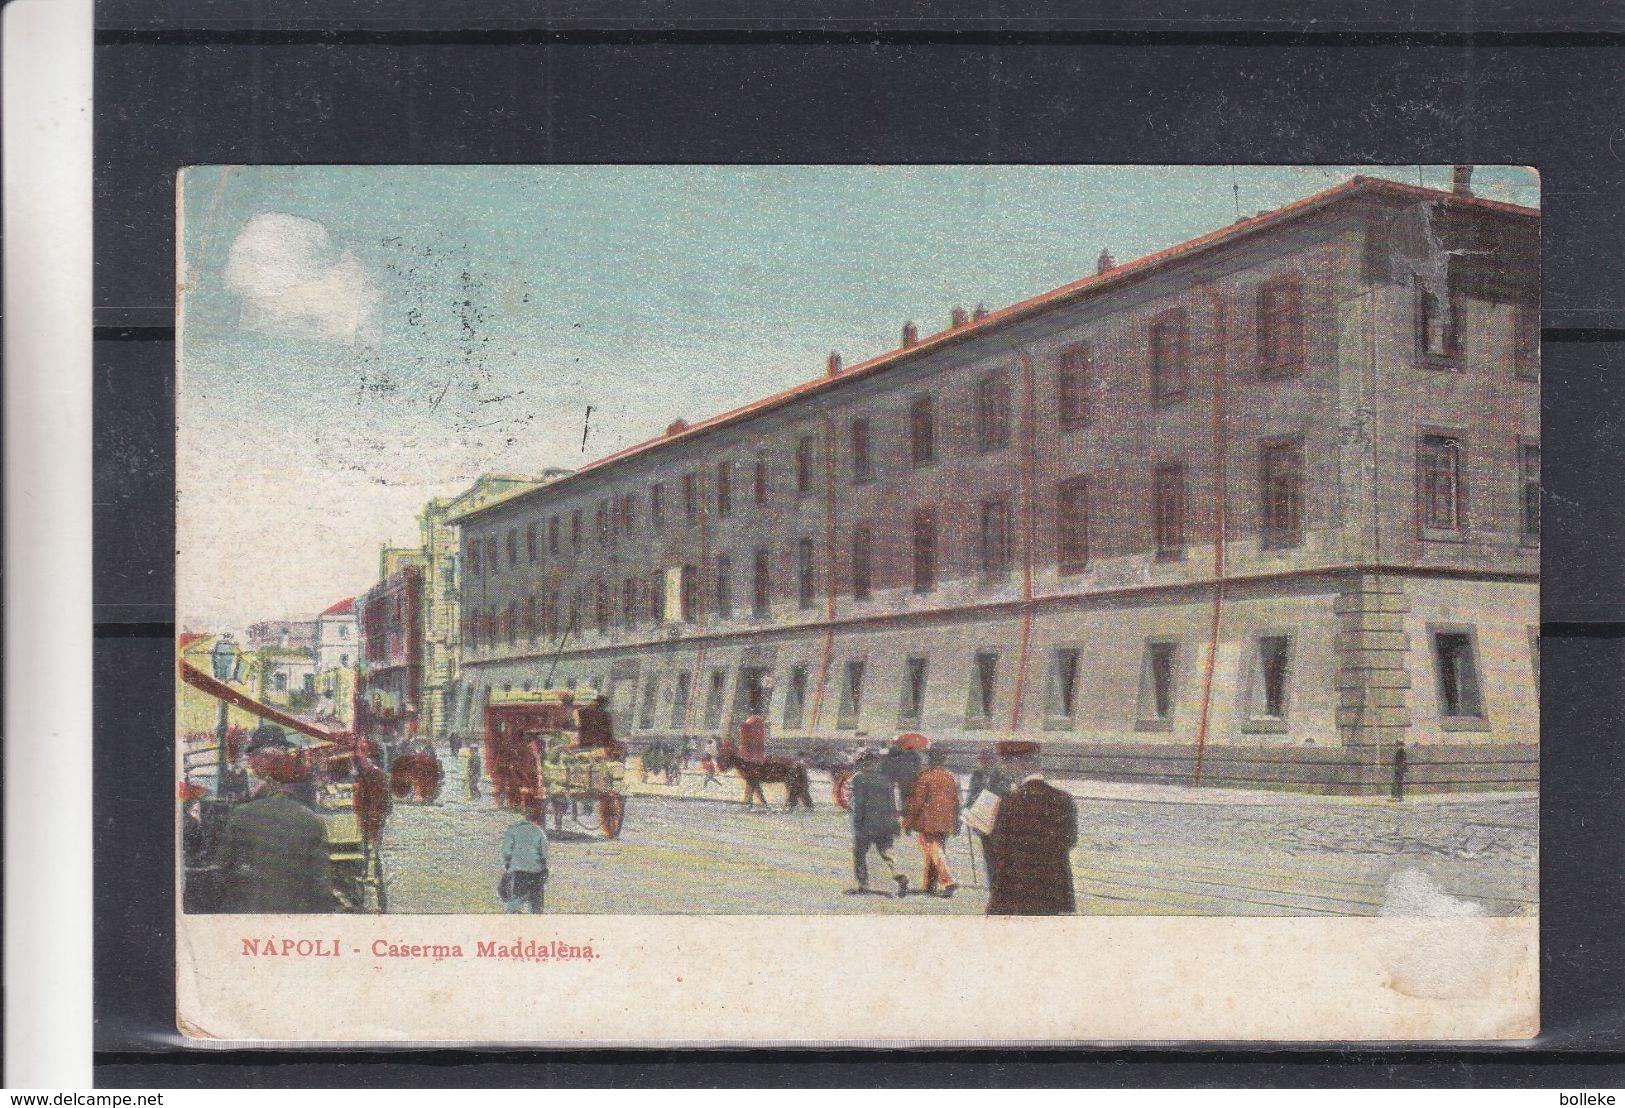 Indes Néerlandaises - Carte Postale De 1908 - Oblit Bindjei  ? - Exp Vers Haarlem Au Pays Bas - Netherlands Indies